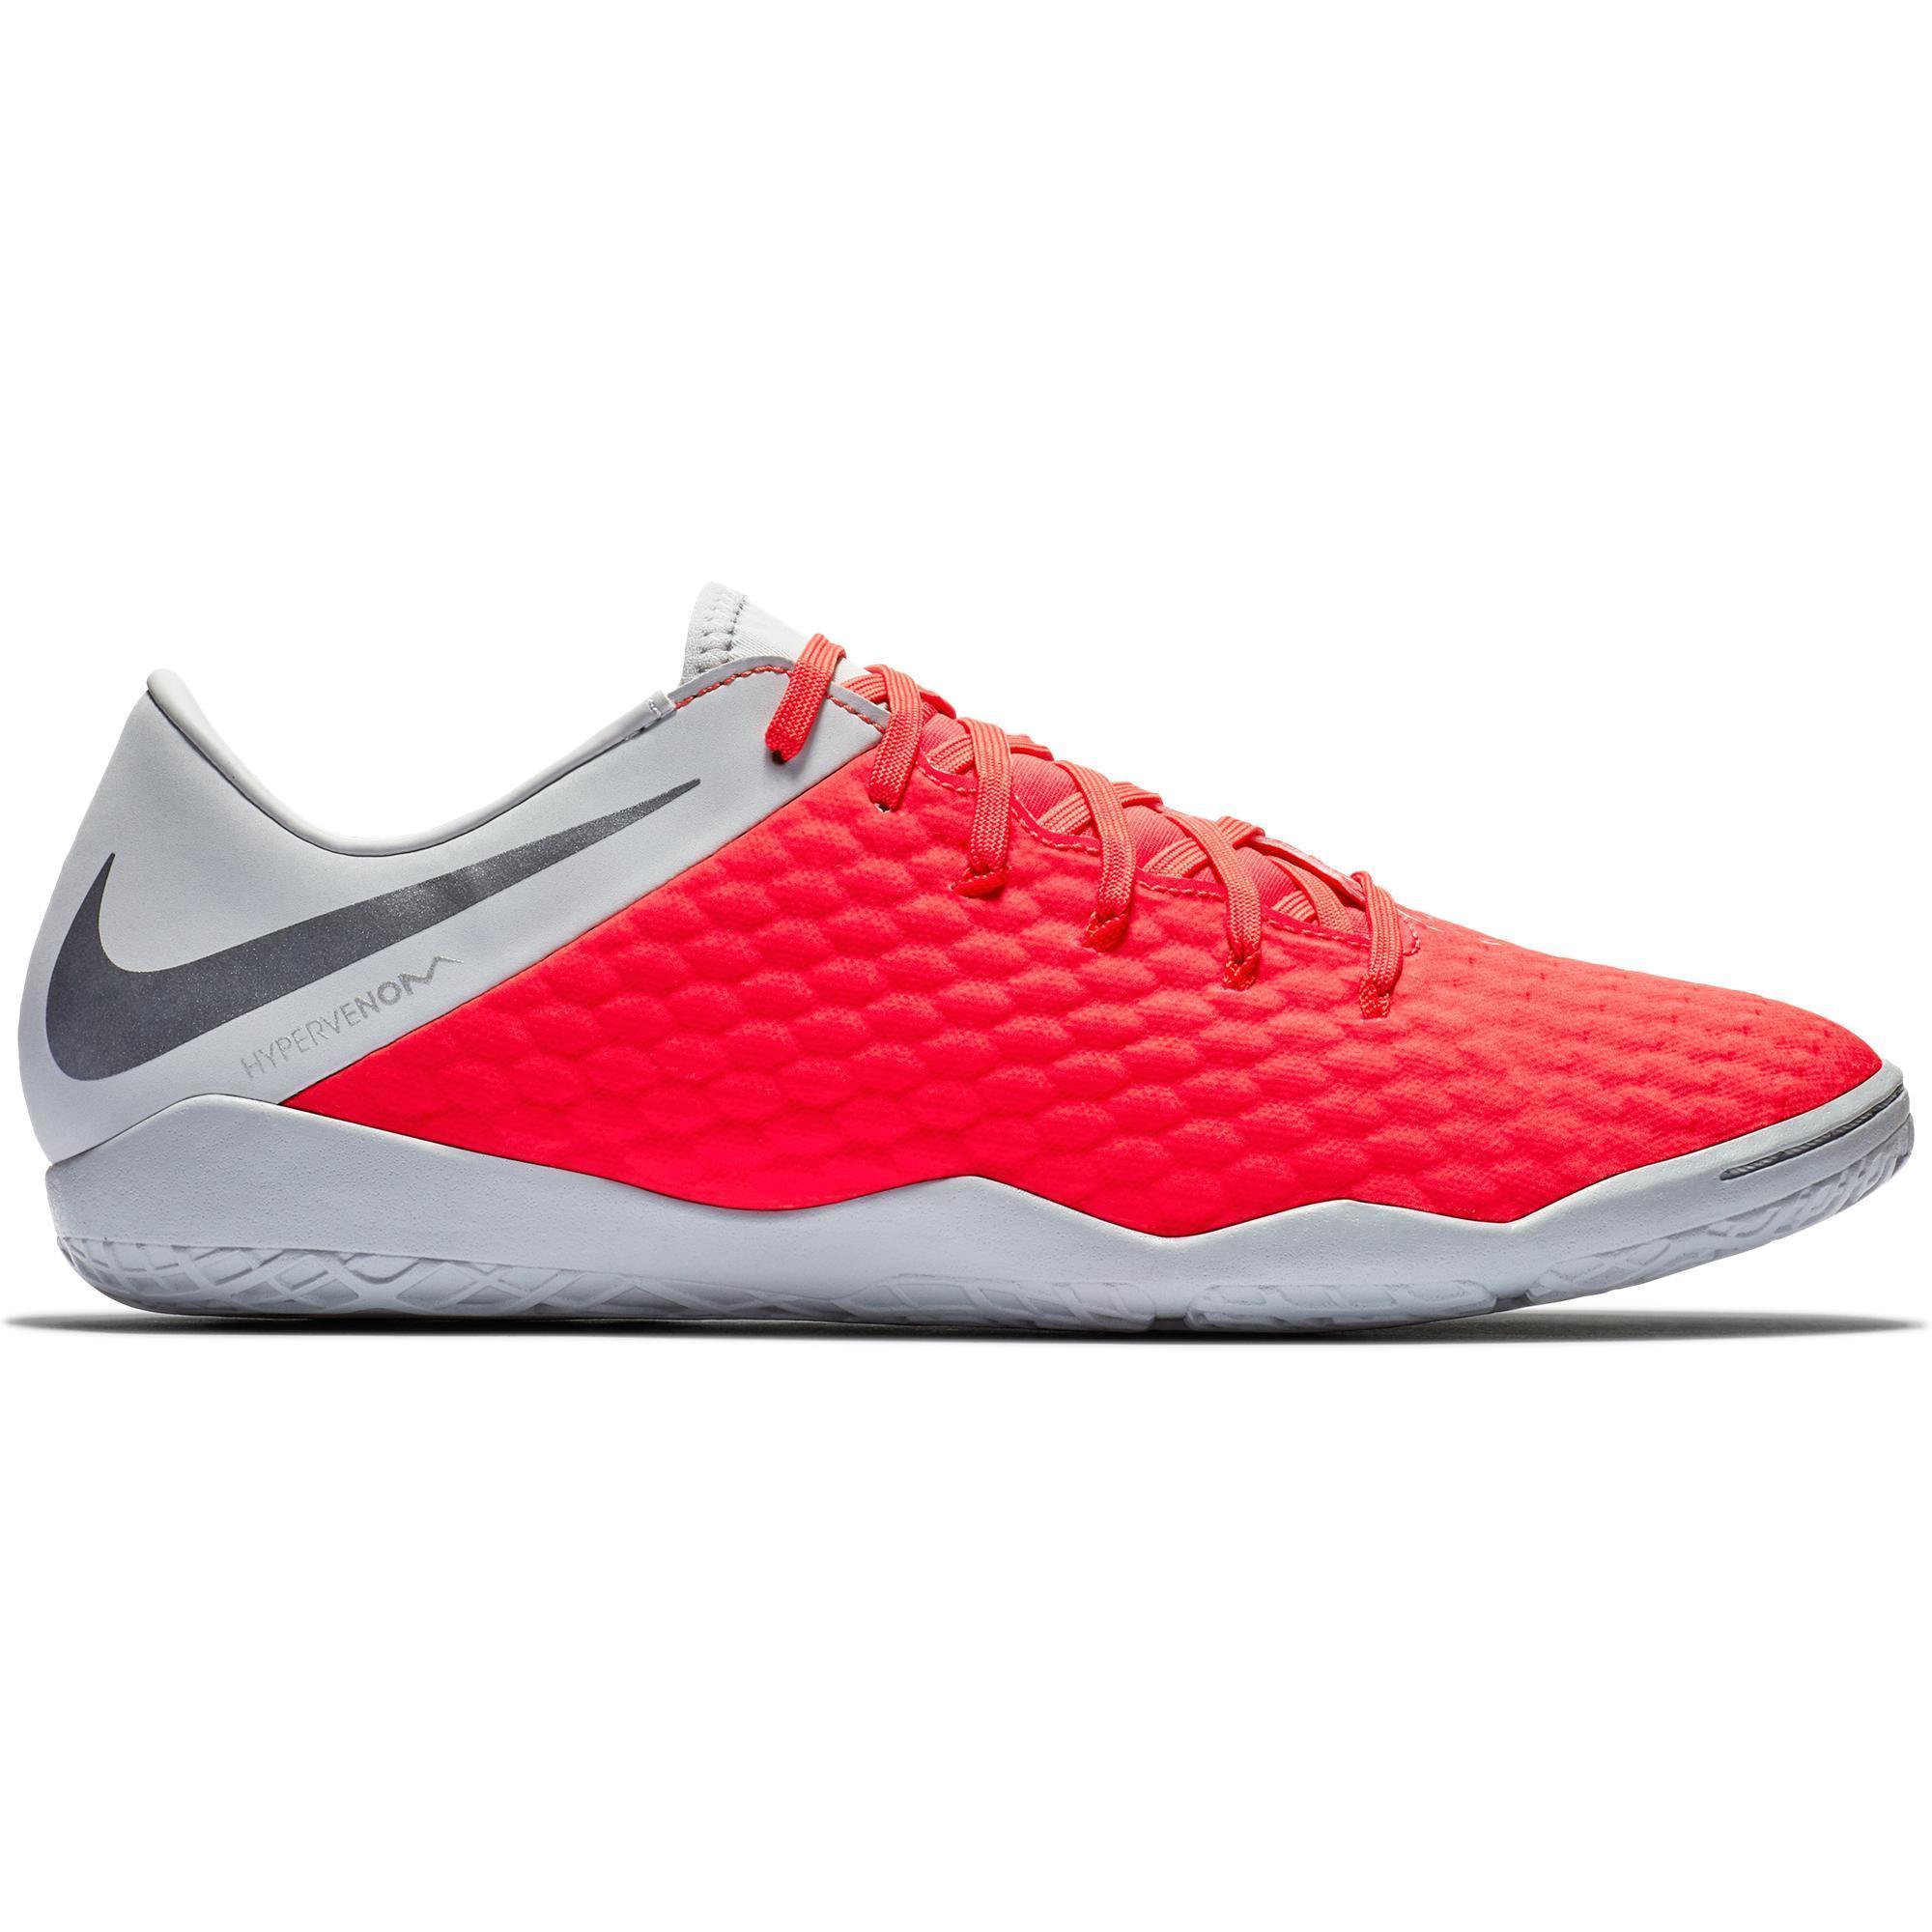 Nike Zaalvoetbalschoenen Hypervenom Phantom III Academy IC volwassenen grijsrood 40 EUR 51.99